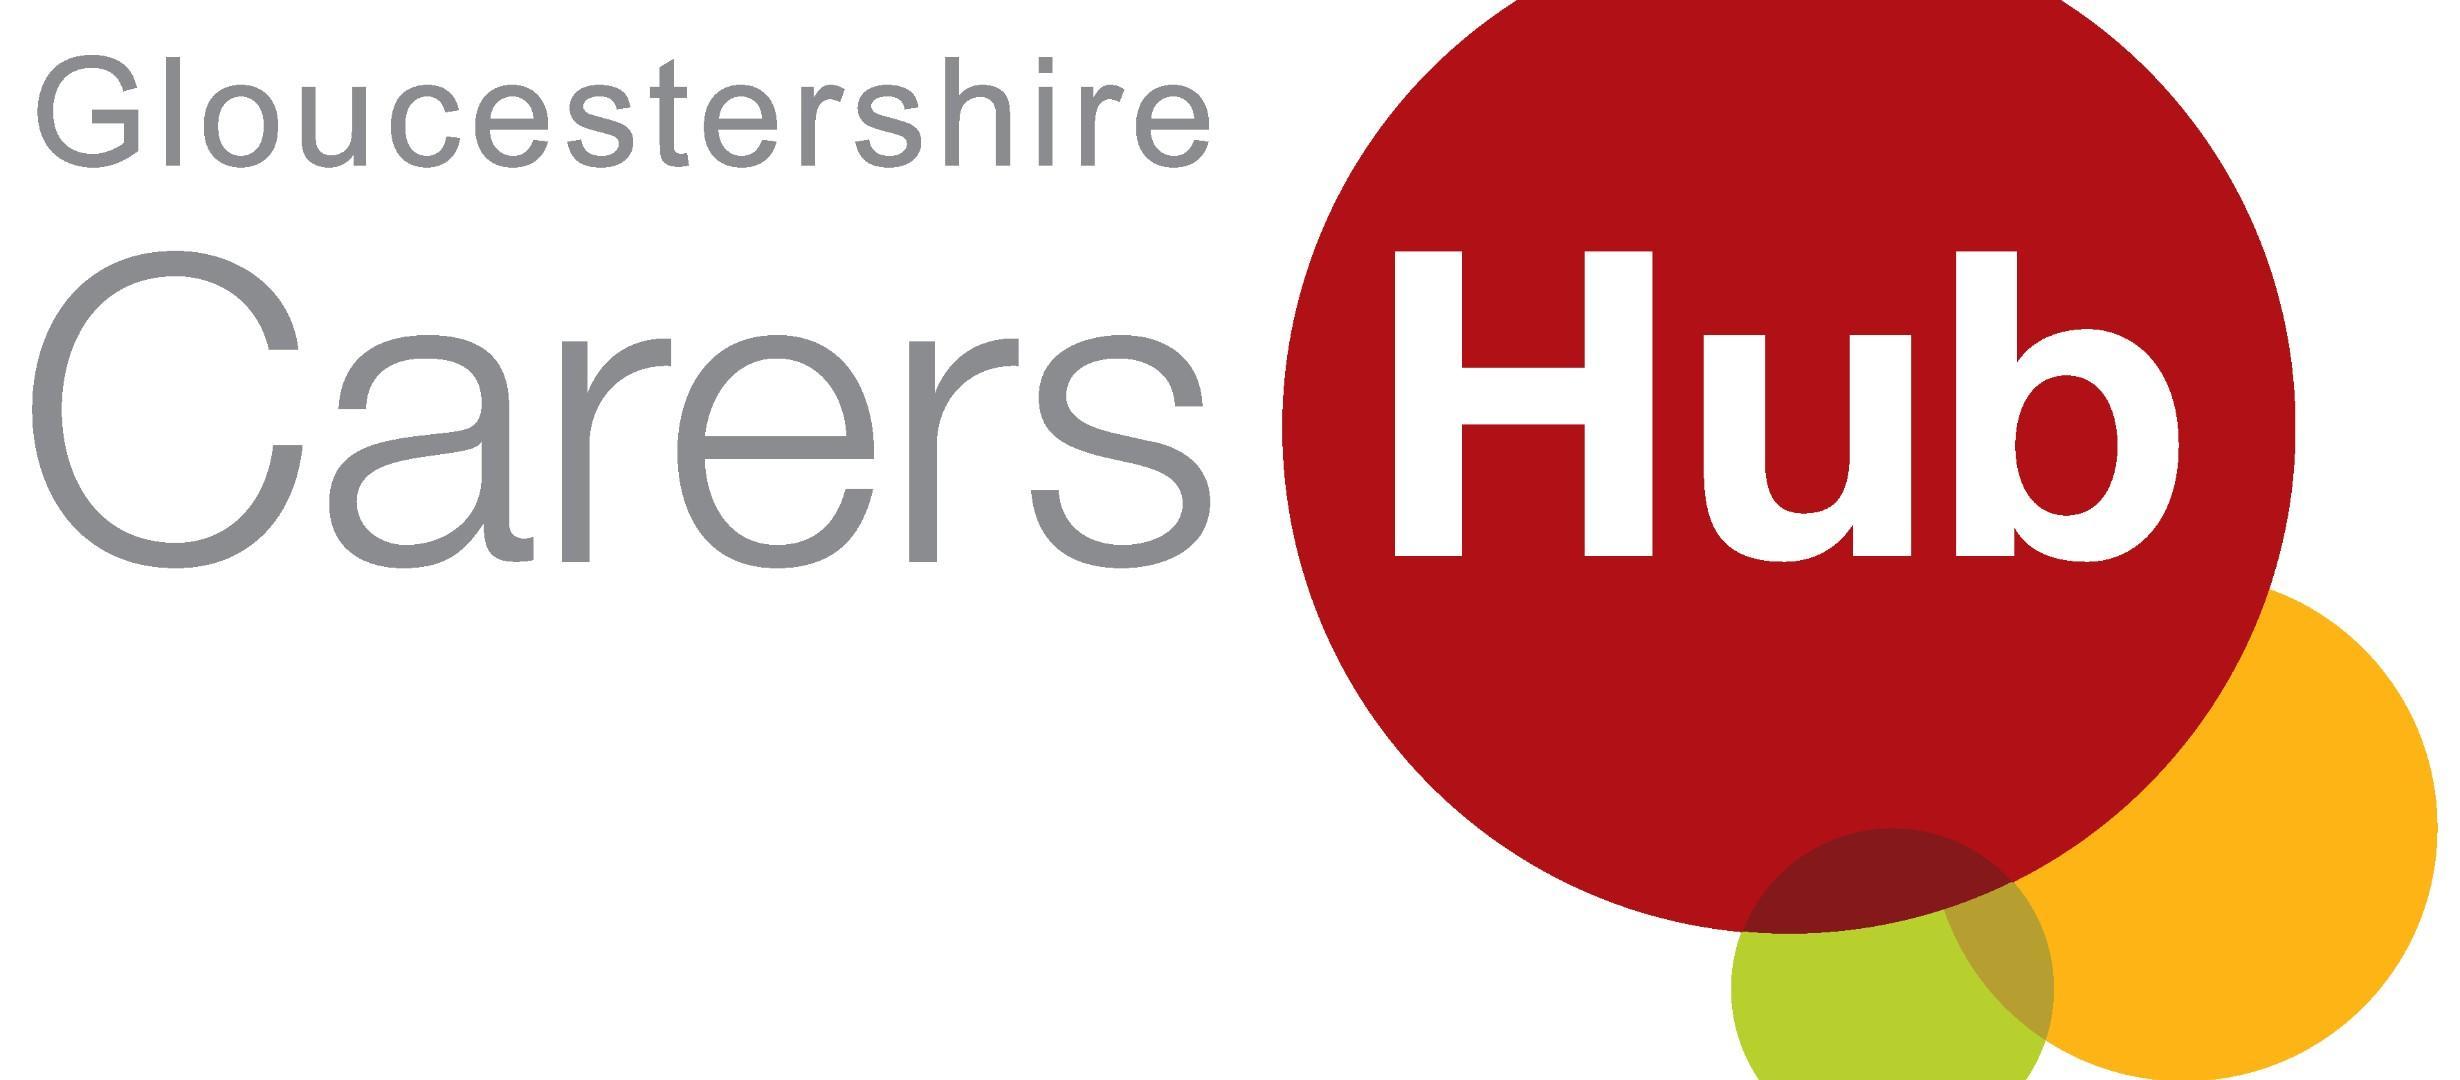 Gloucestershire Carers Hub logo